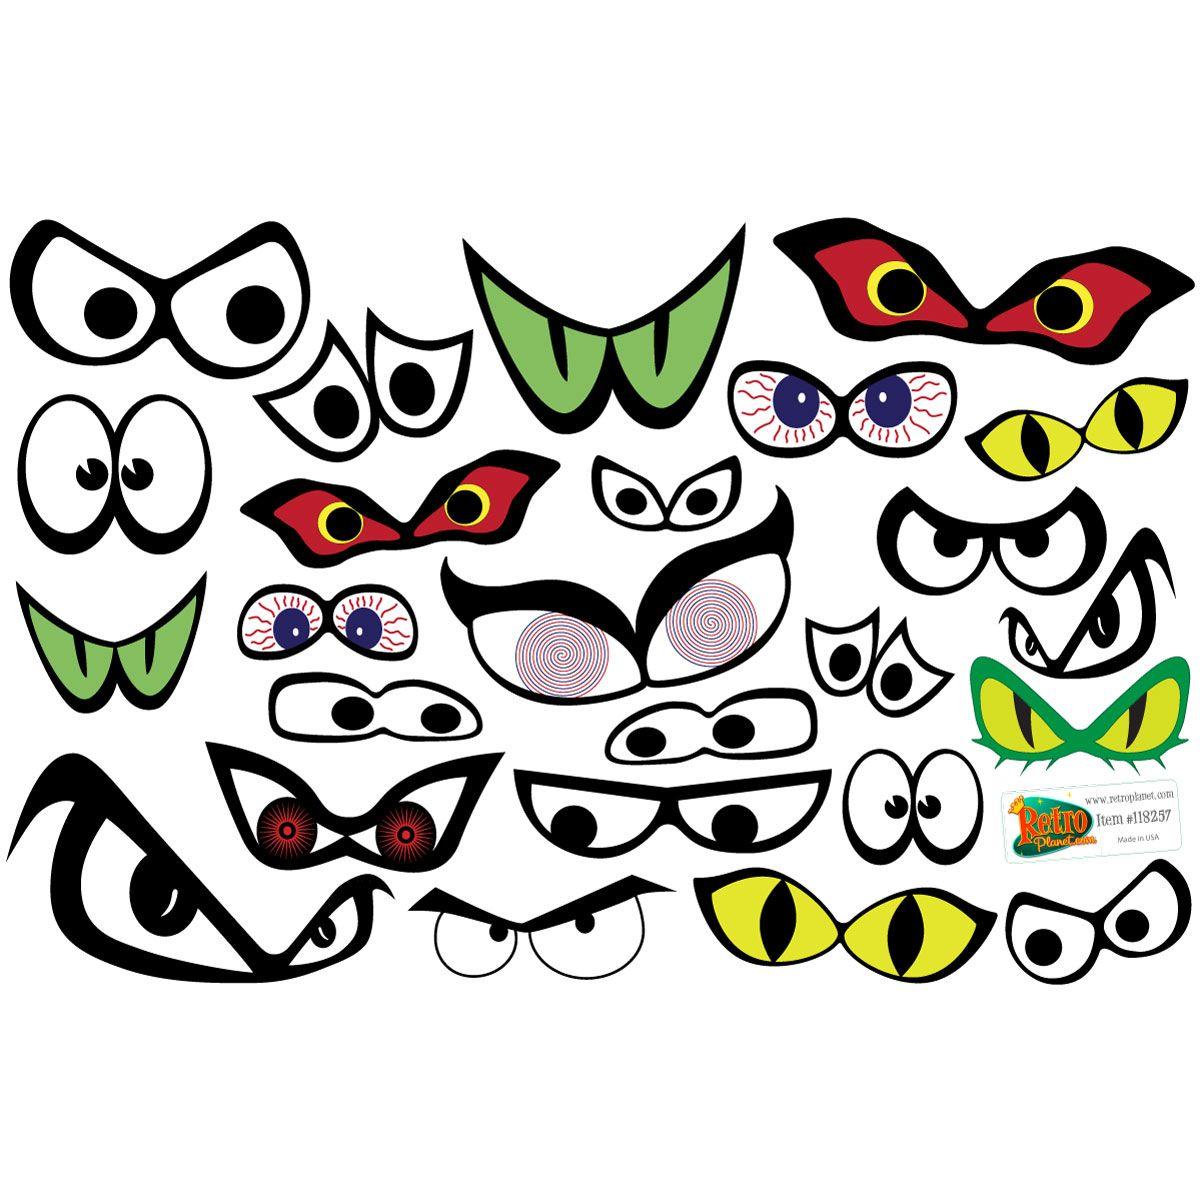 Spooky Eyes Halloween Craft Vinyl Sticker Set Of 25 Spooky Eyes Graffiti Alphabet Graffiti Lettering